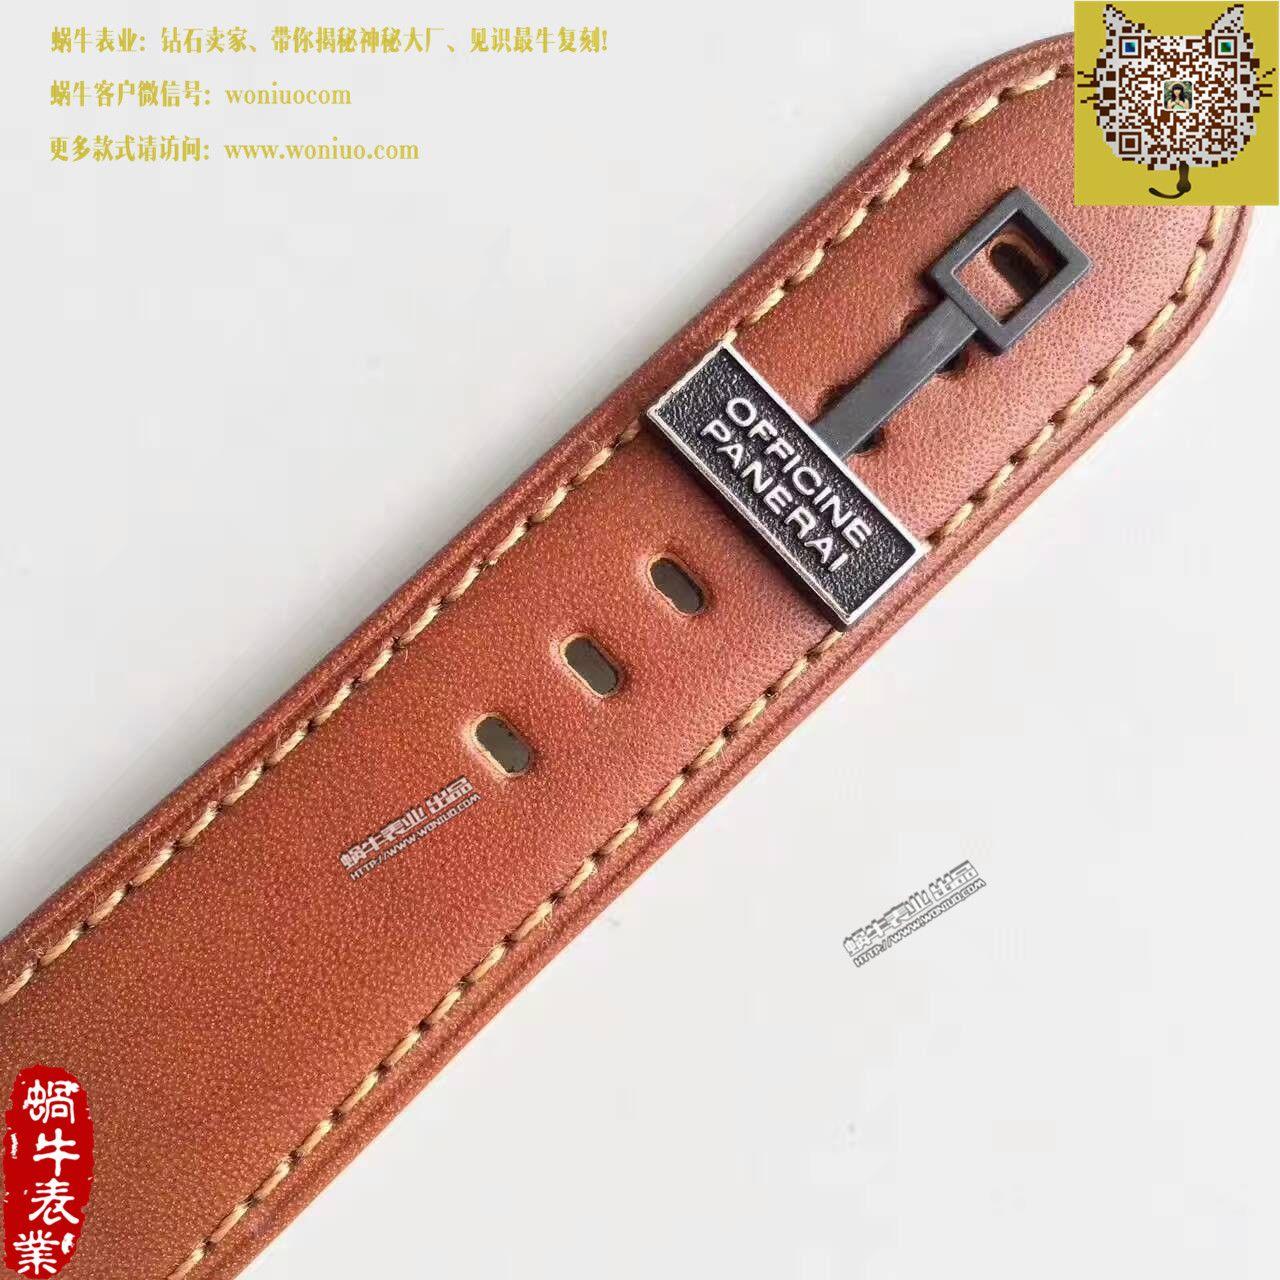 【N厂成名之作V4版】沛纳海LUMINOR系列PAM 00005腕表